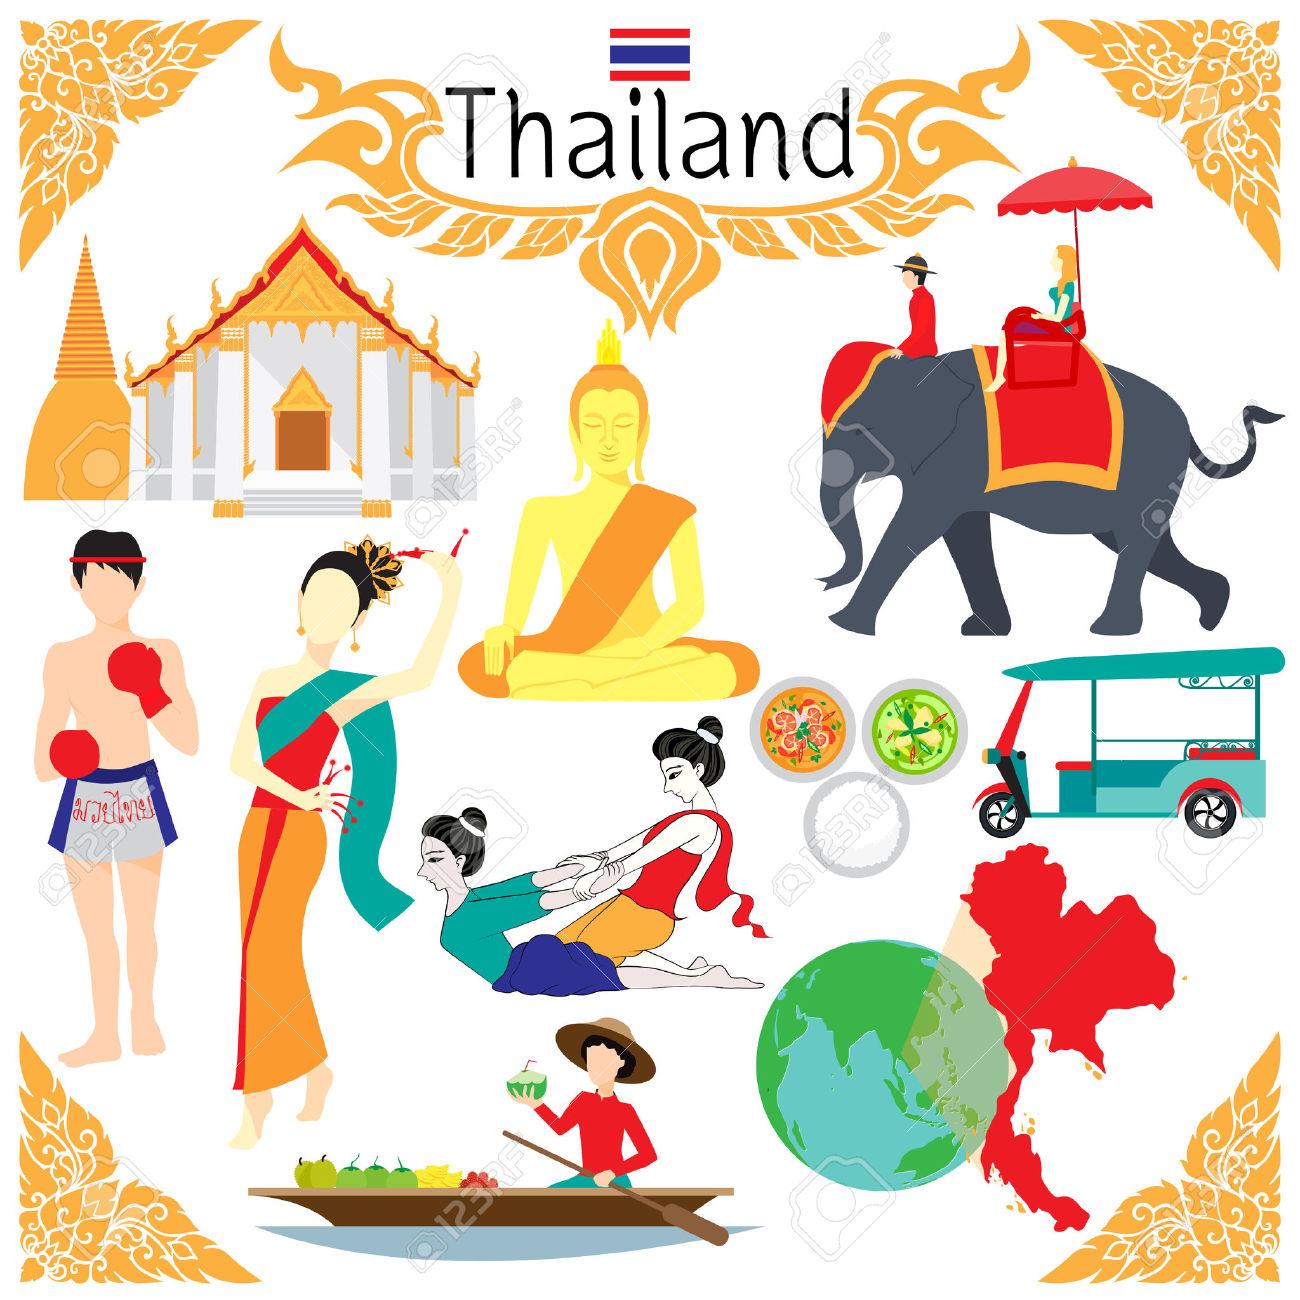 Thailand clipart 9 » Clipart Station.